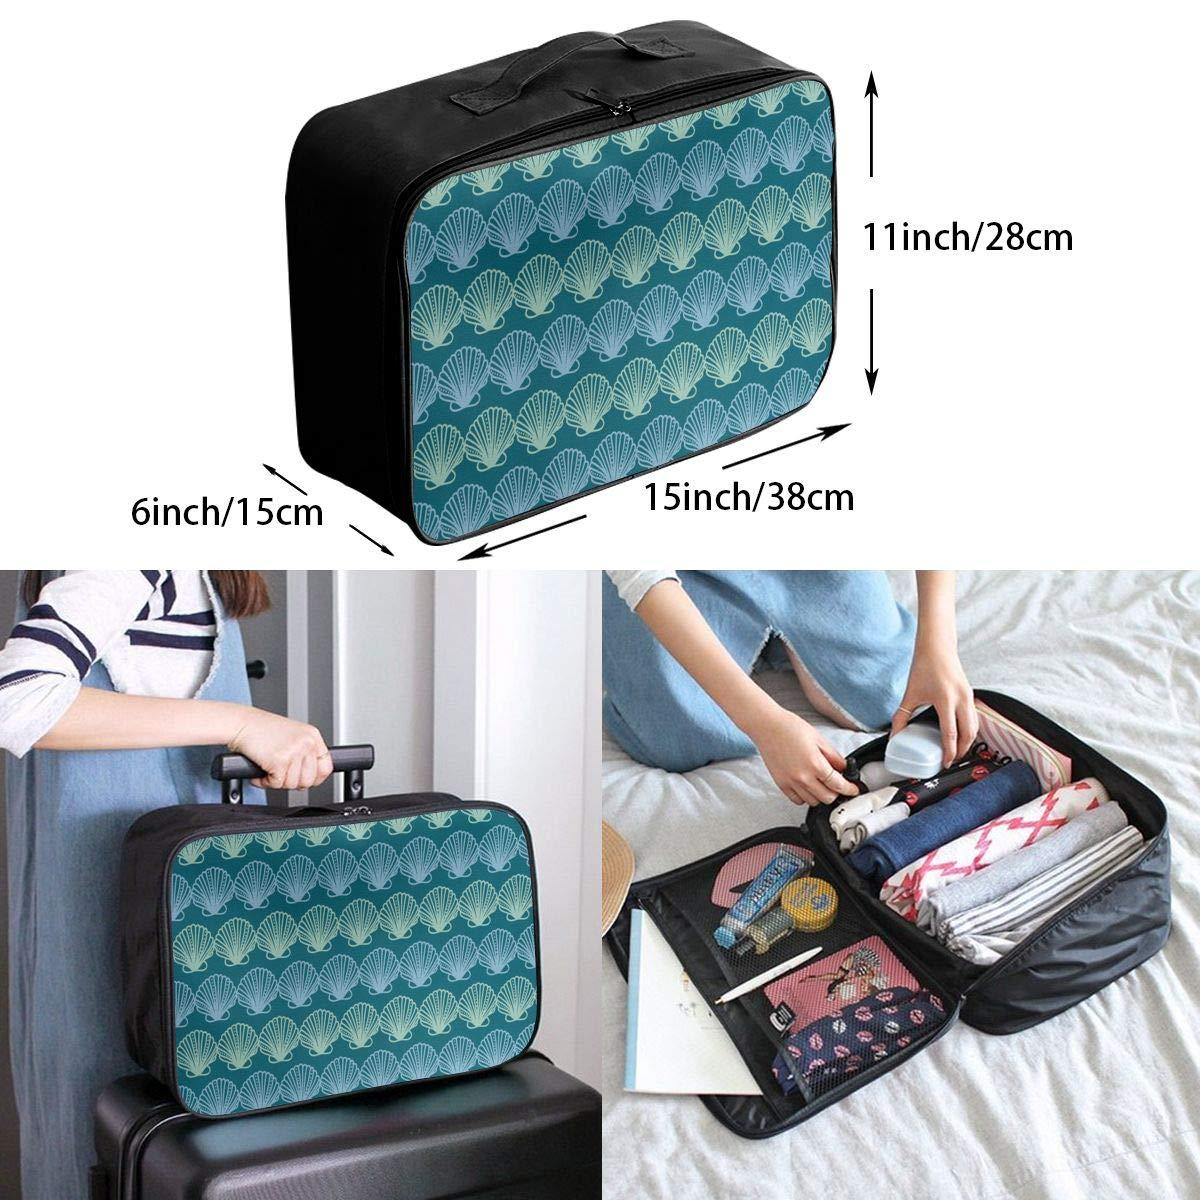 ADGAI Sealife Image with Under Water Canvas Travel Weekender Bag,Fashion Custom Lightweight Large Capacity Portable Luggage Bag,Suitcase Trolley Bag